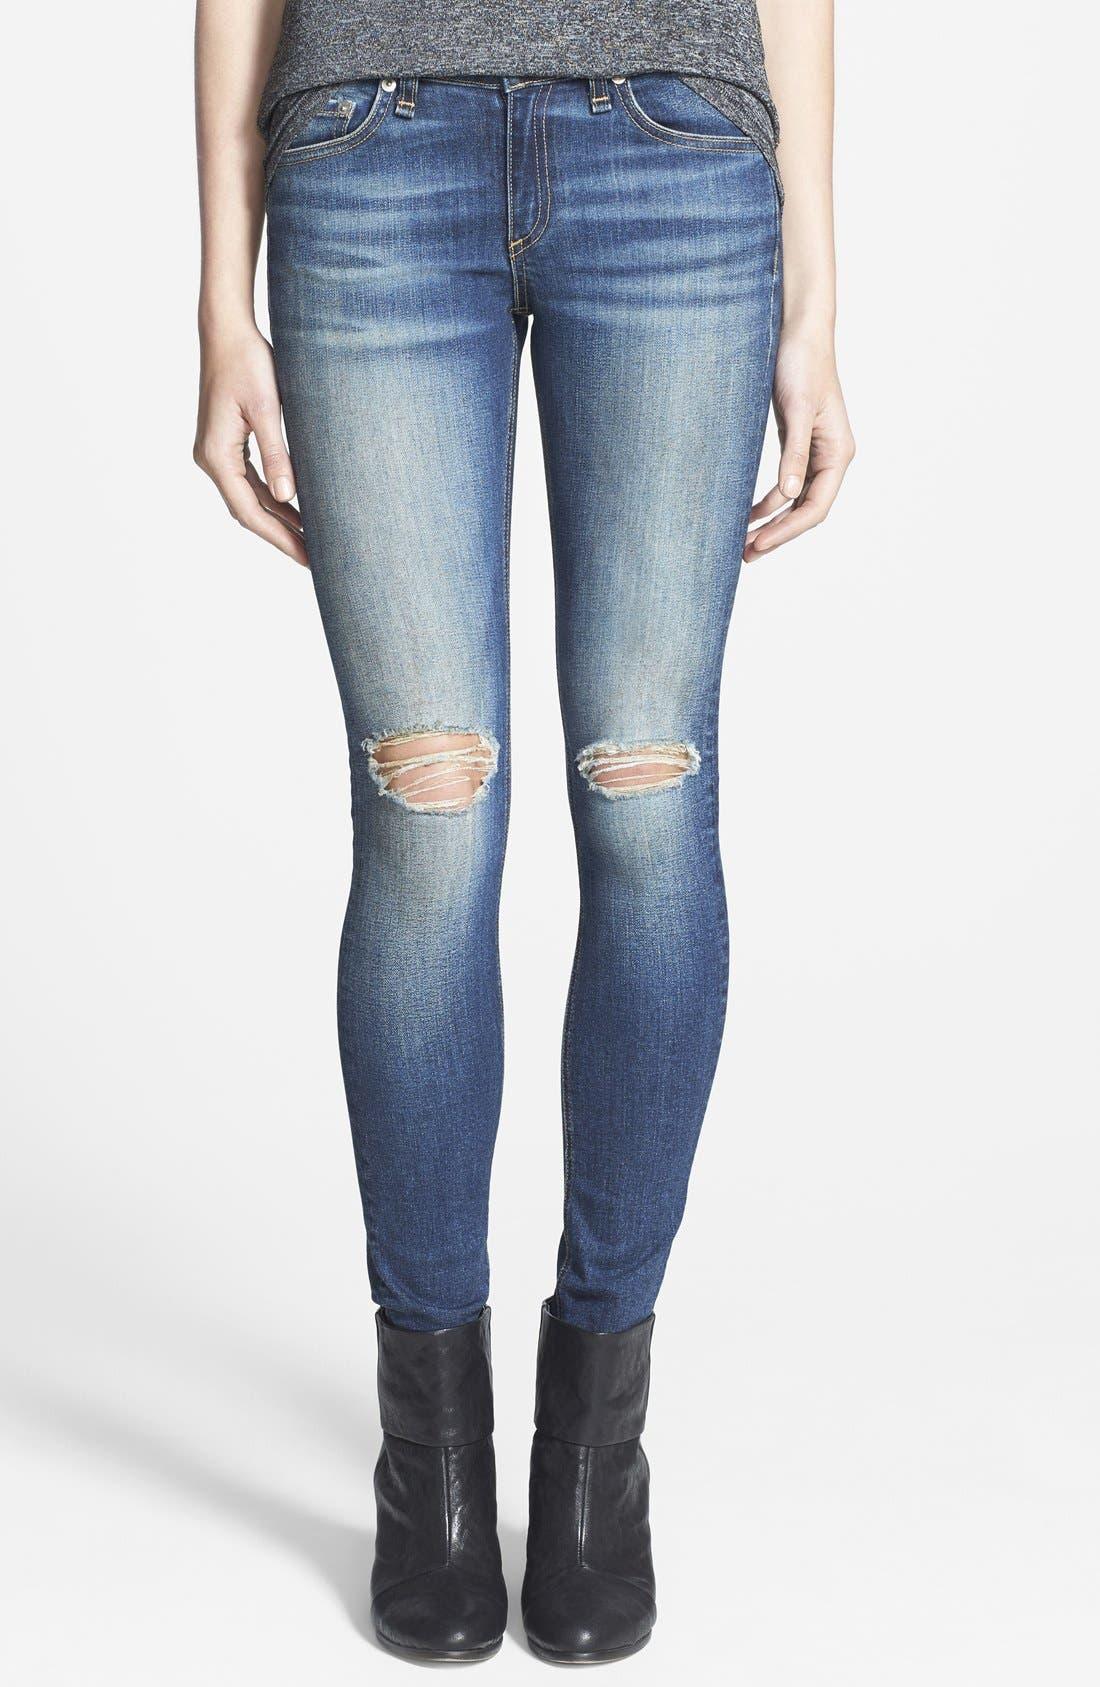 Main Image - rag & bone/JEAN 'The Skinny' Stretch Jeans (Pacifico)